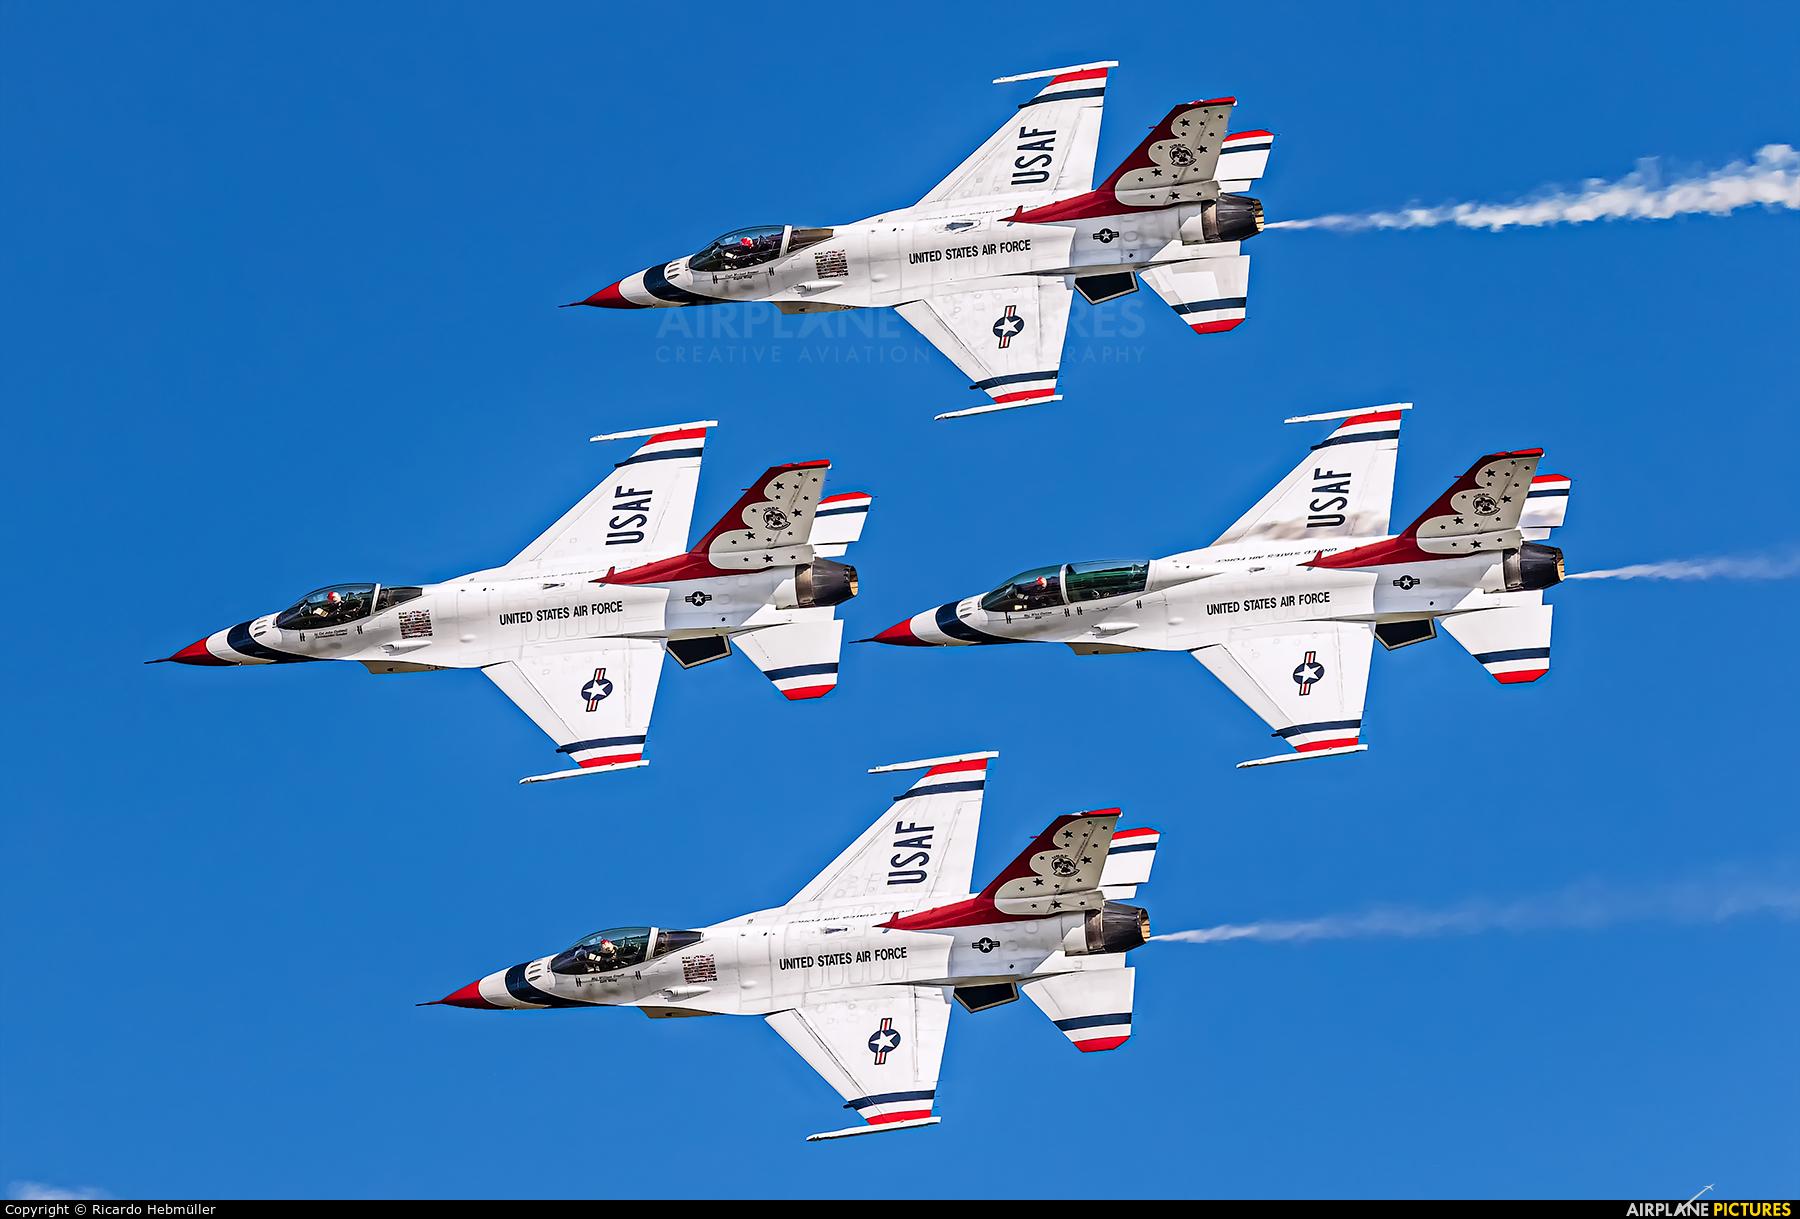 USA - Air Force : Thunderbirds 87-0319 aircraft at Houston - Ellington Field